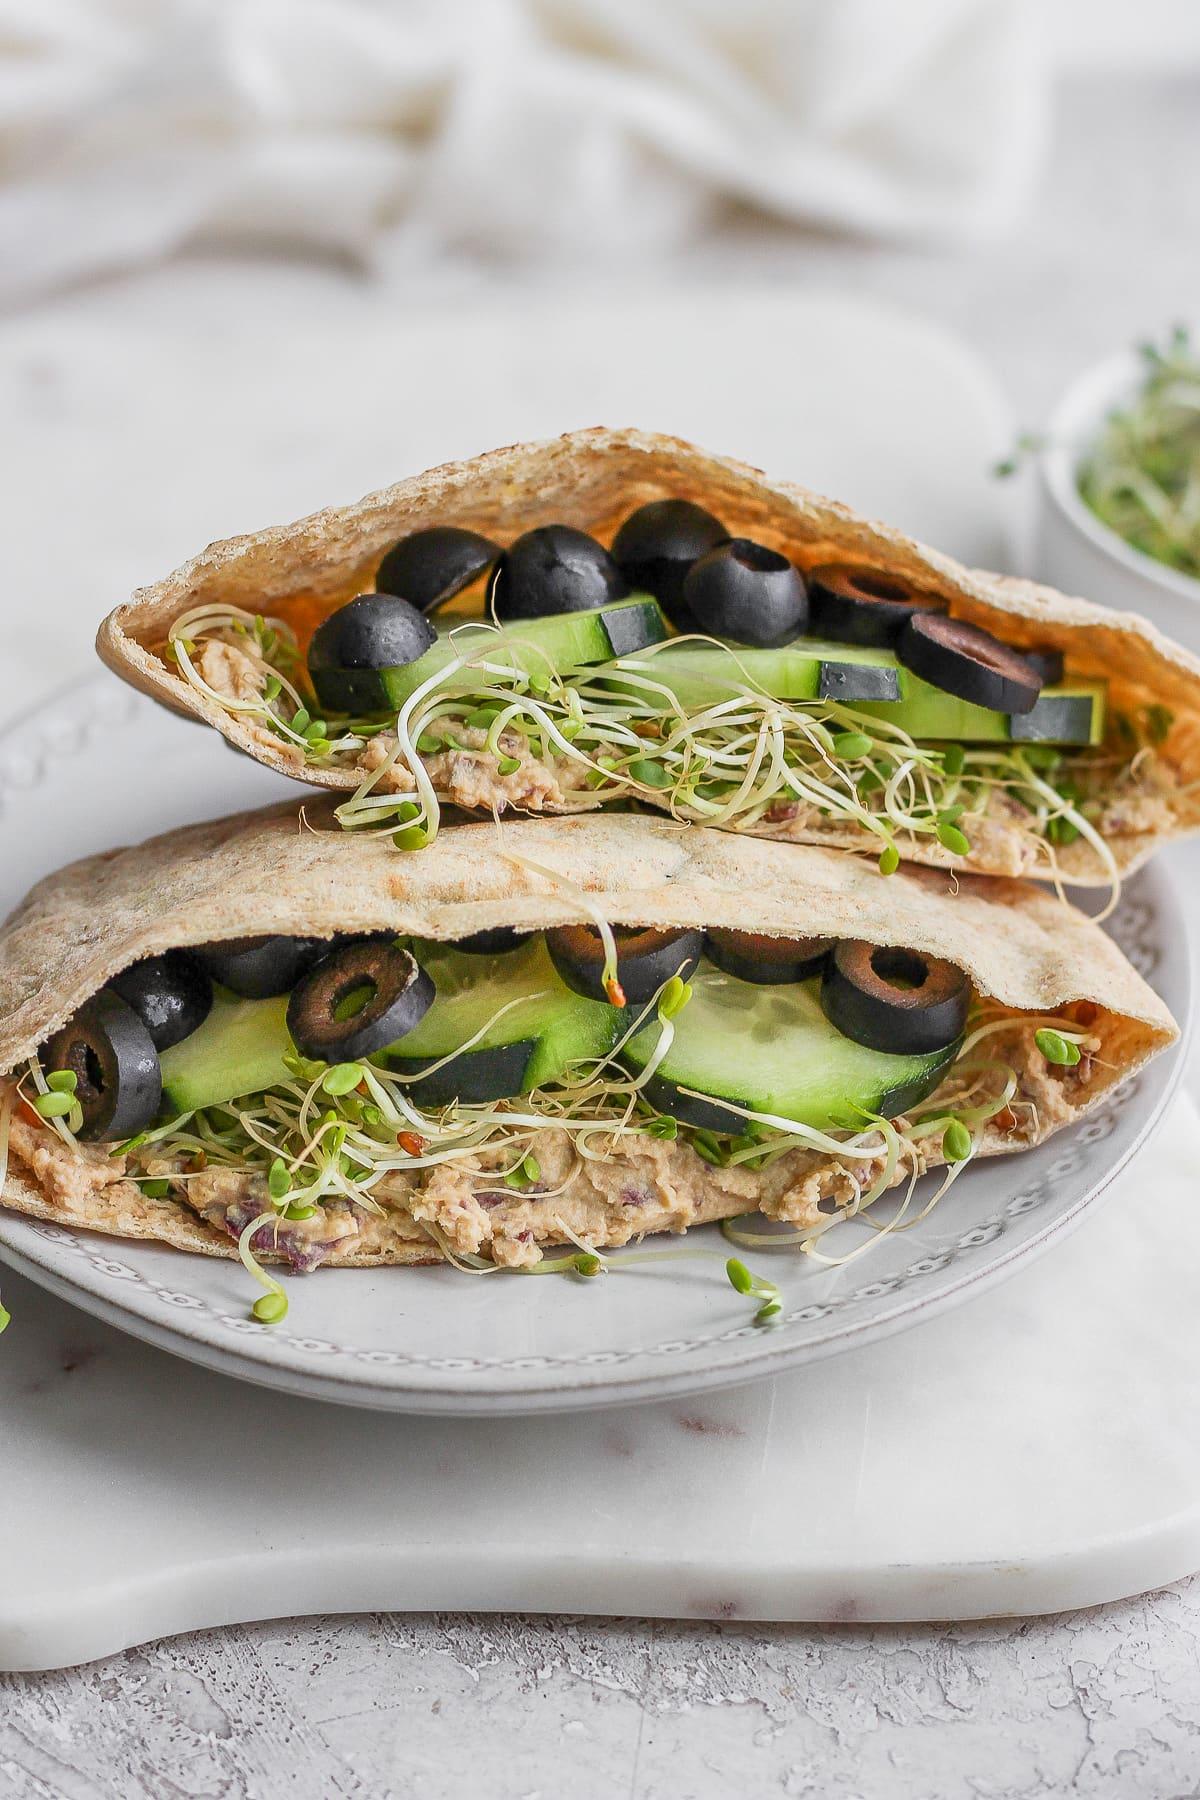 A vegan pita sandwich sitting on a plate.